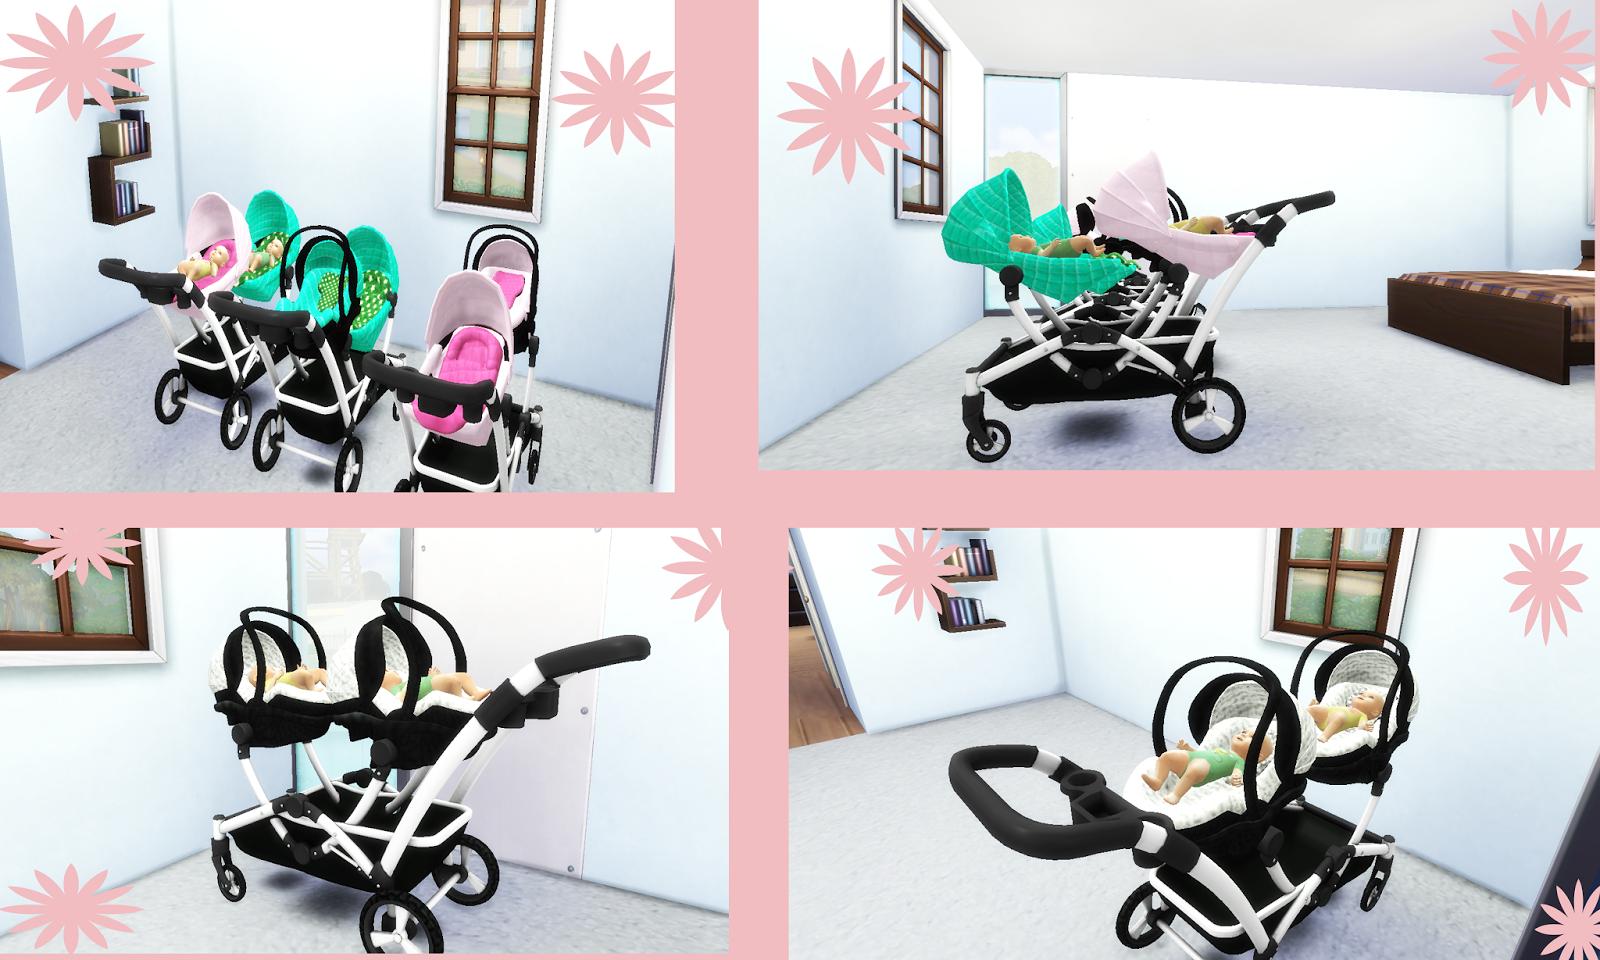 Doublestroller Lena Sims Cc Sims4 Pinterest Sims